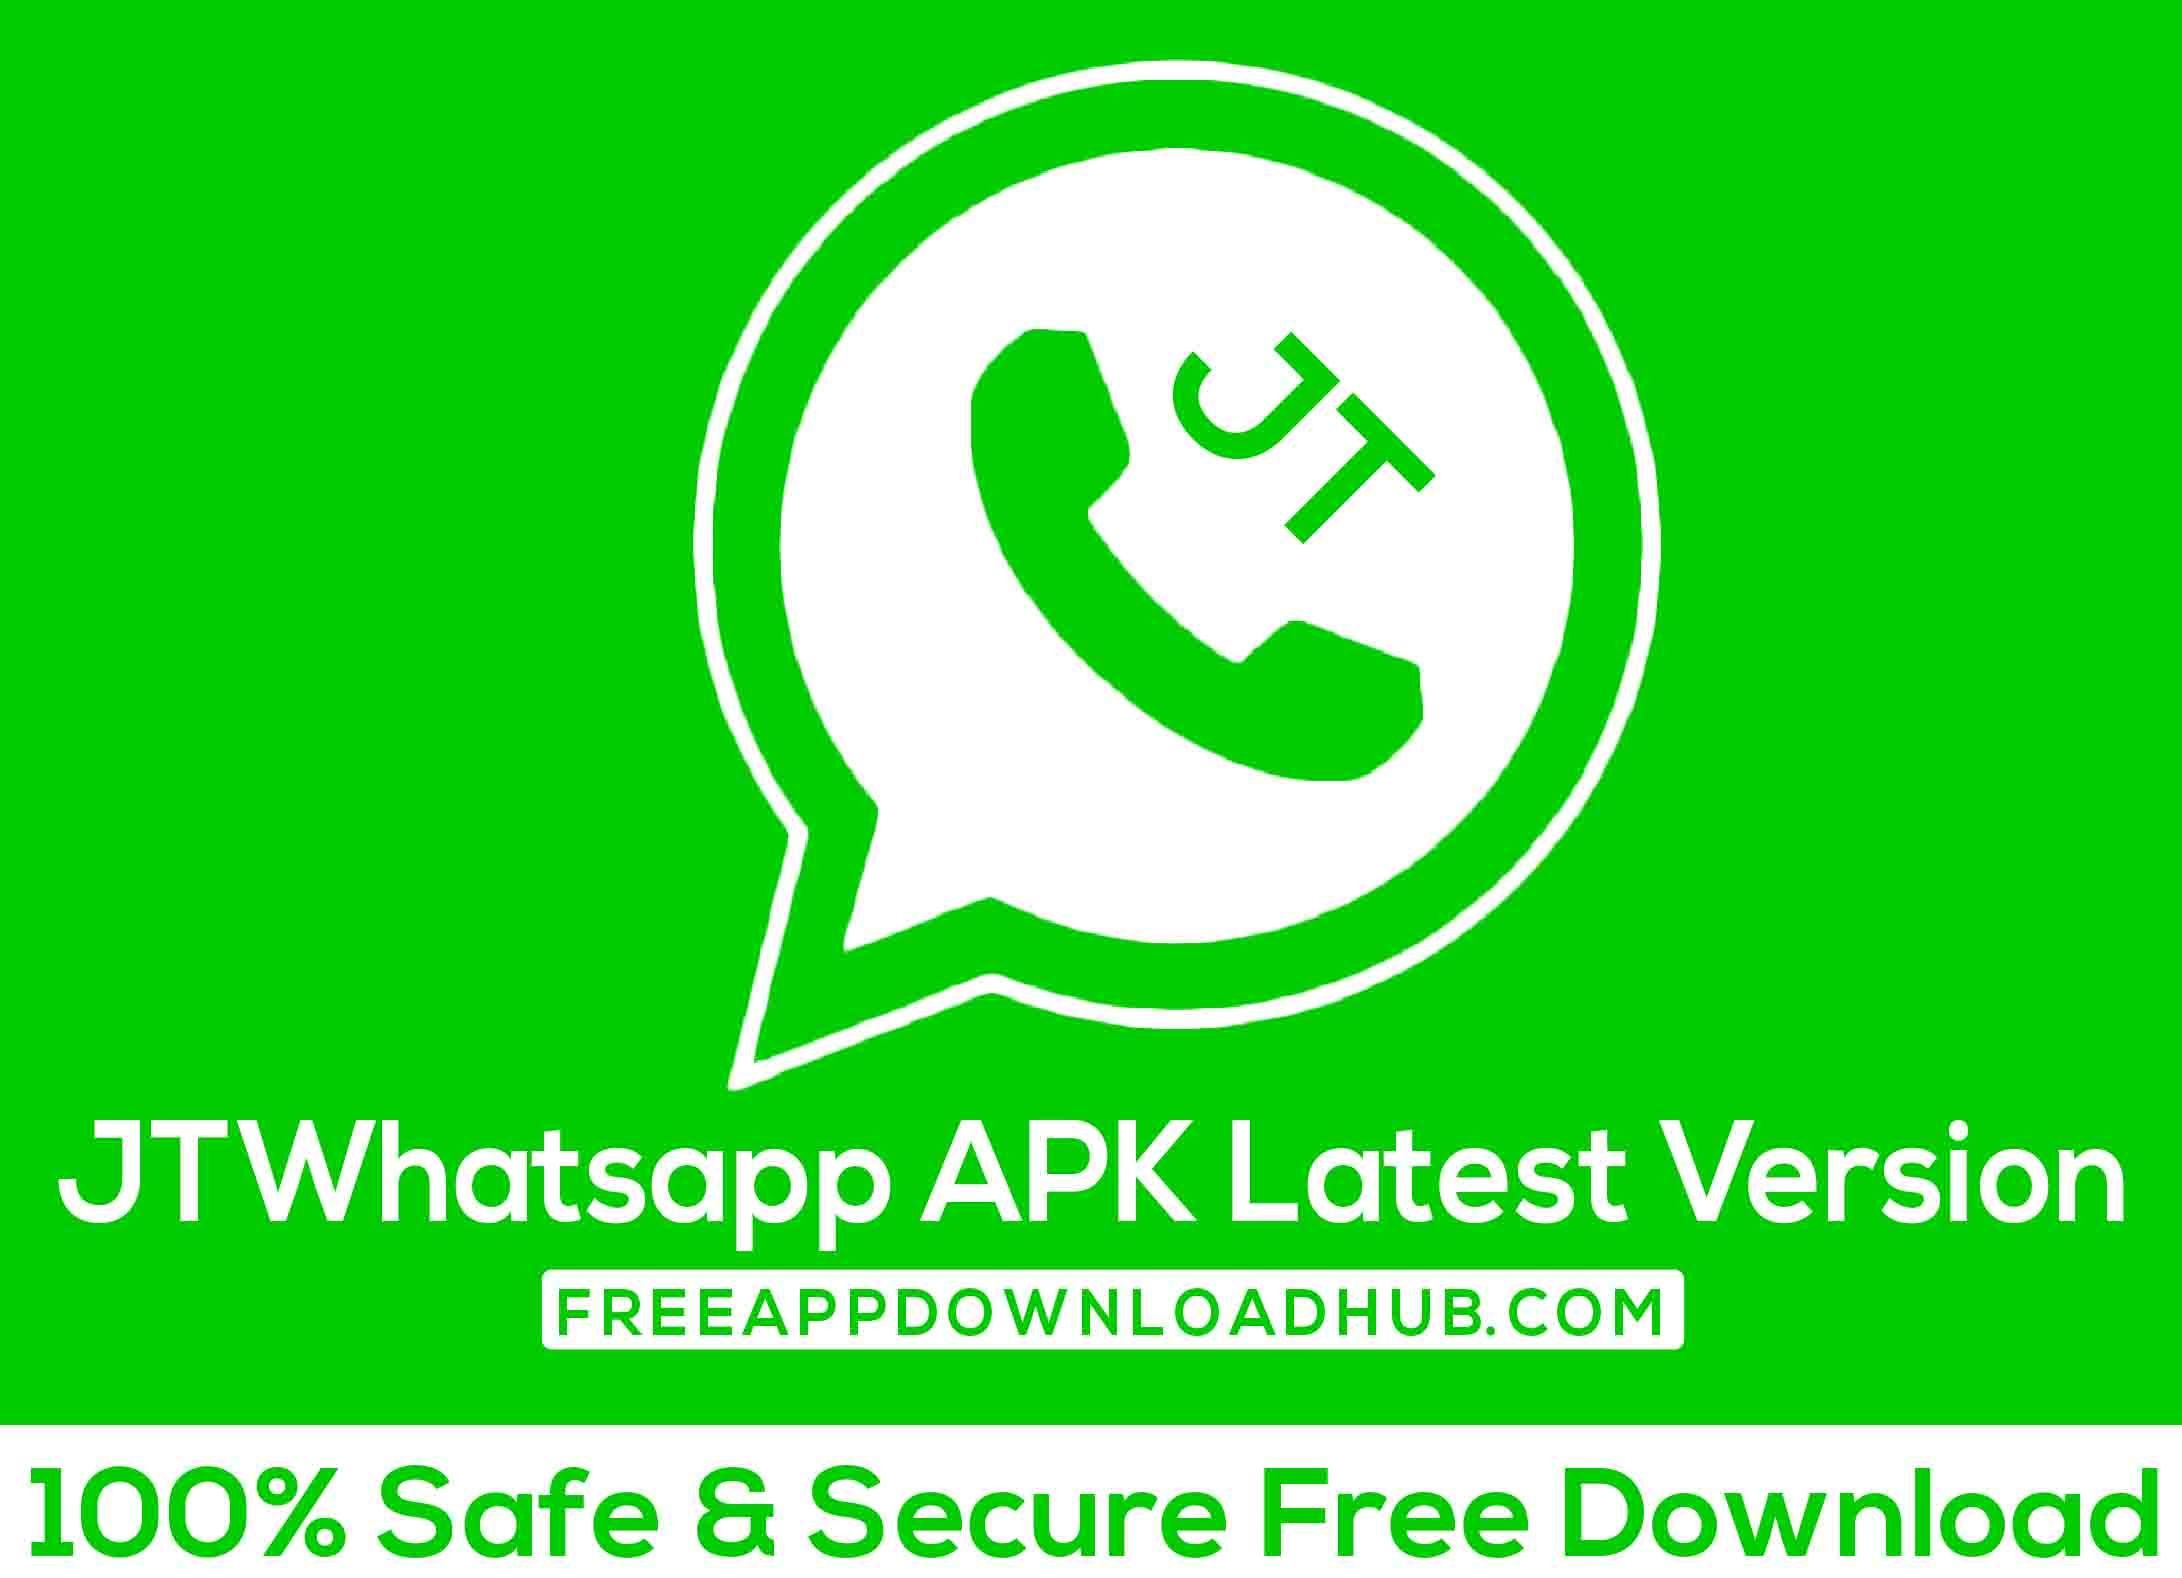 Jtwhatsapp Latestjtwhatsapp Officialjtwhatsapp Freedownload Antiban Freeappdownloadhub New Emojis Version Large Video